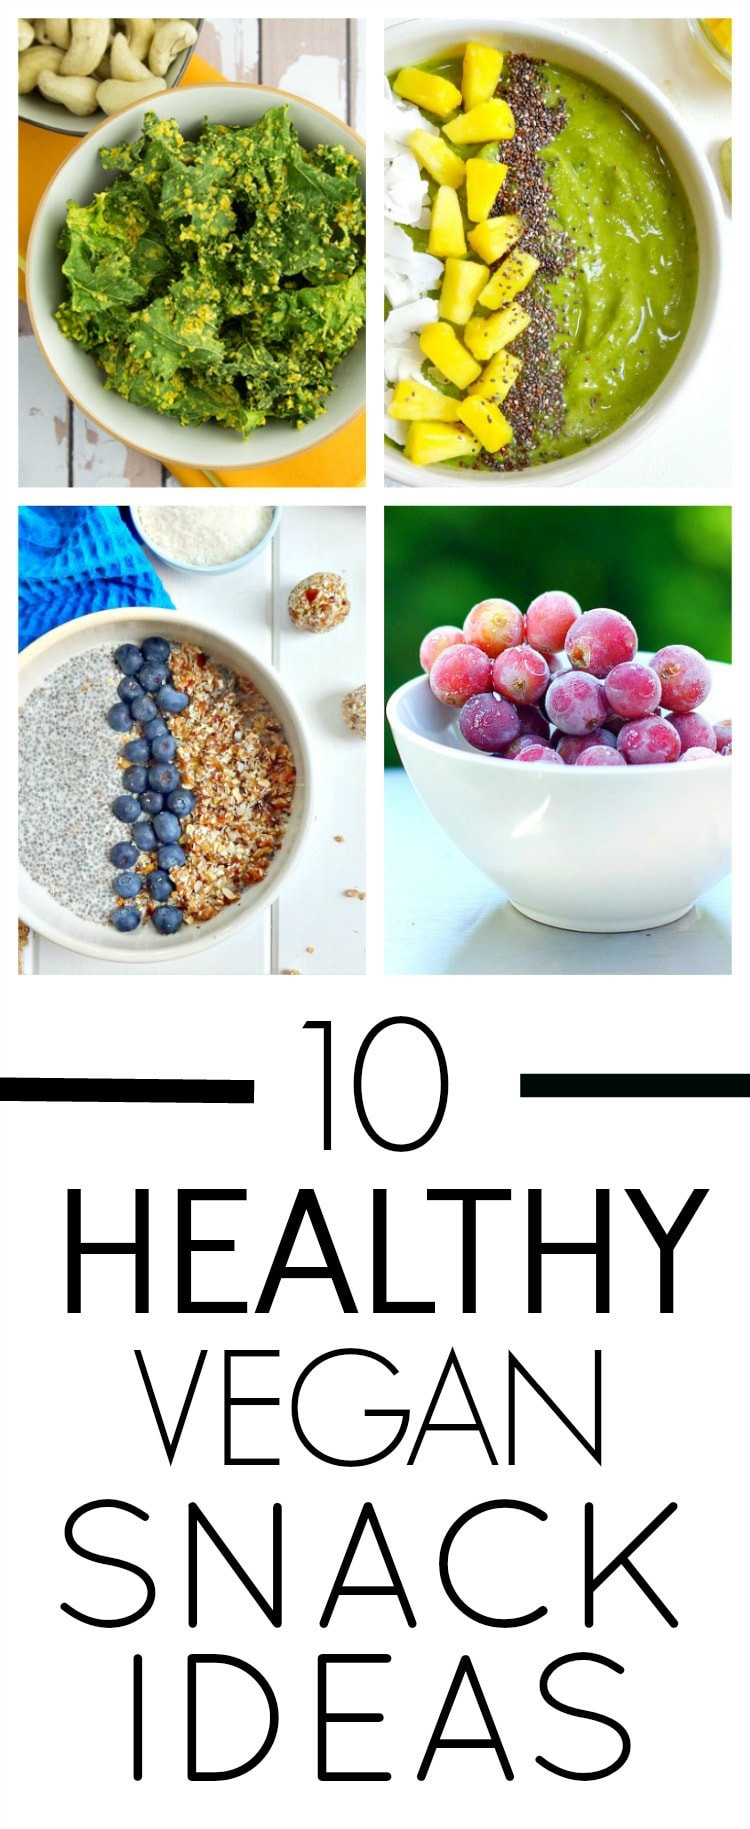 Healthy Vegan Snack Recipes  10 Healthy Vegan Snack Ideas The Glowing Fridge